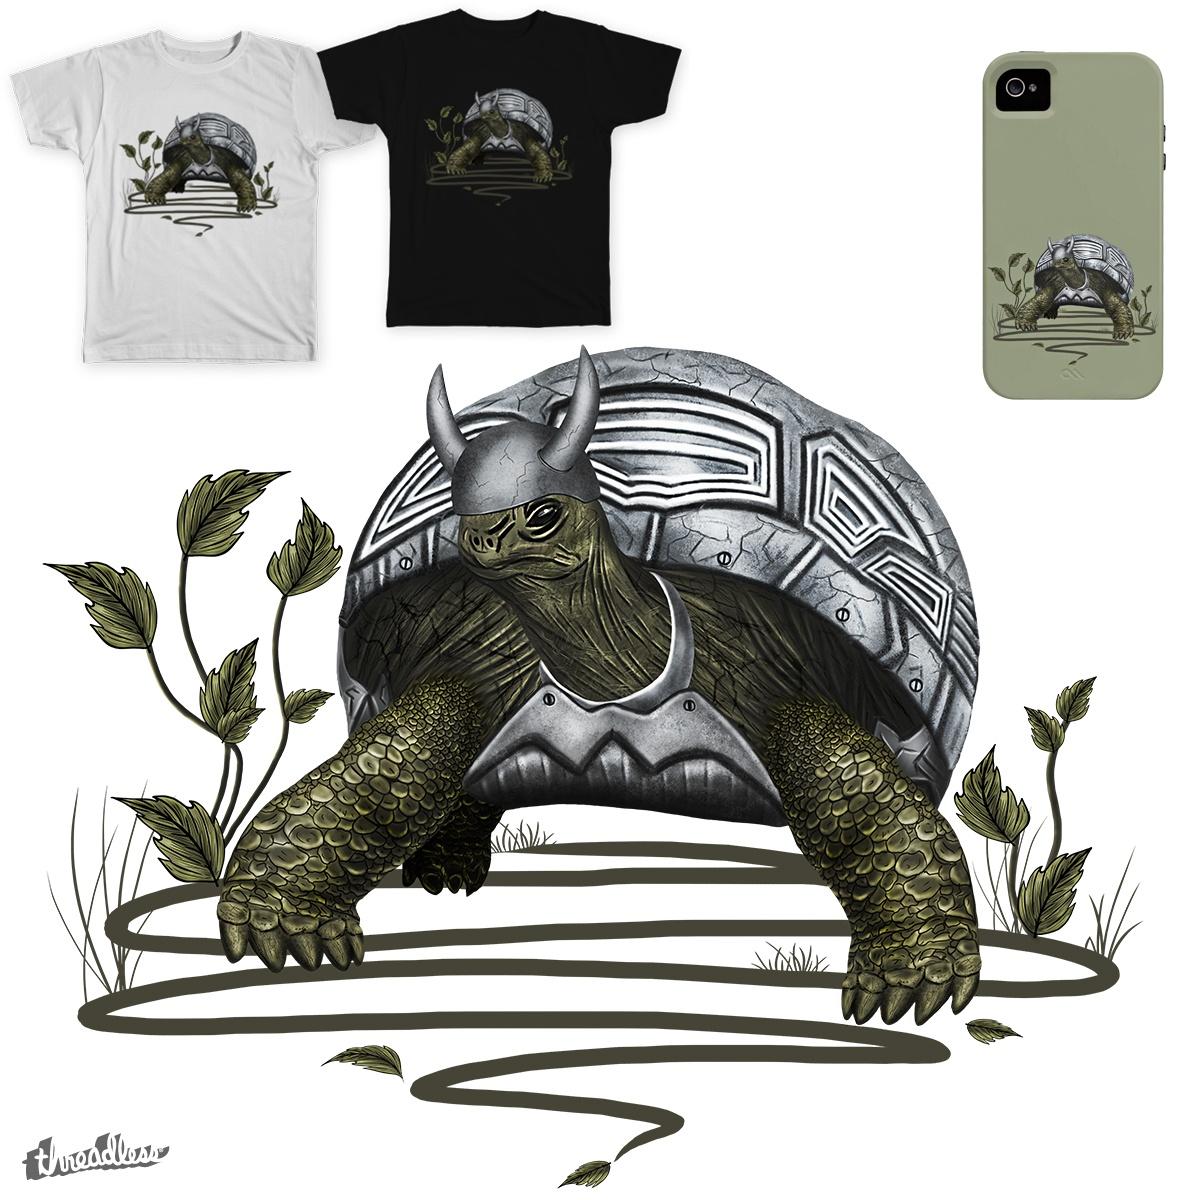 Old turtle warrior by lermannika on Threadless